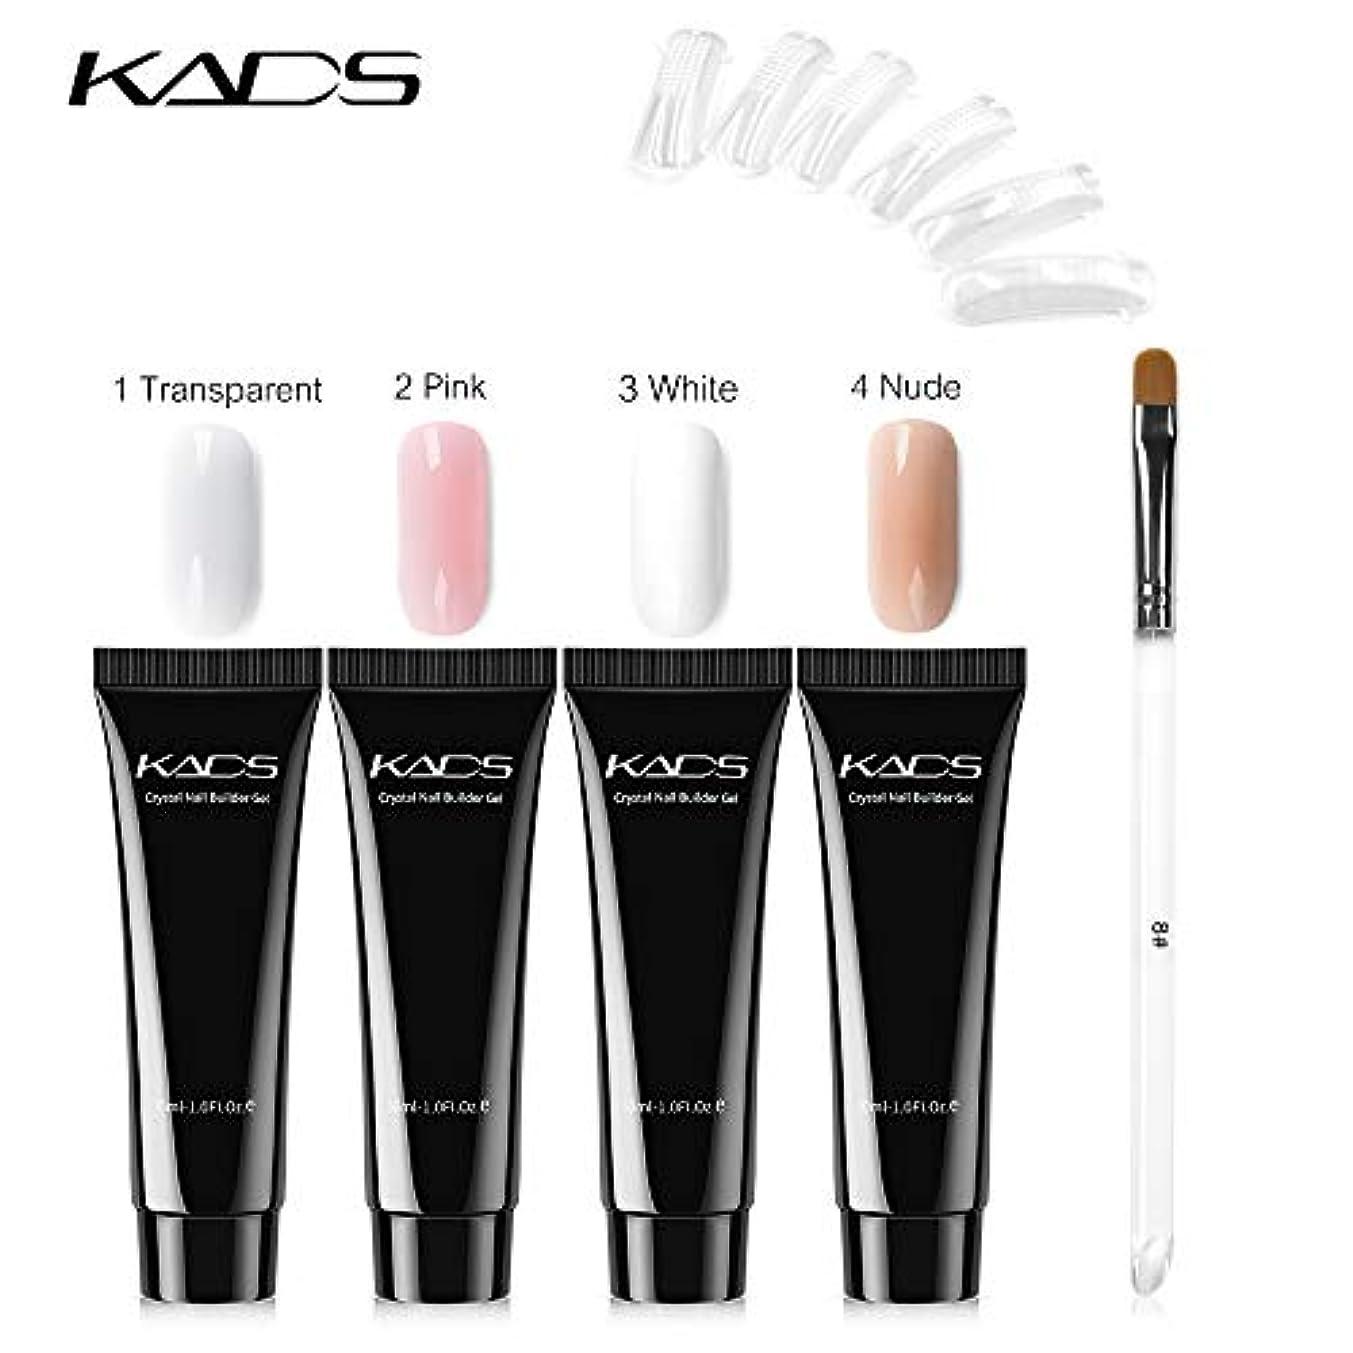 KADS 長さだしジェルネイル 6点セット UV/LED対応 長さだしチップ+ジェルネイルブラシ 簡単に長さだし (セット2)